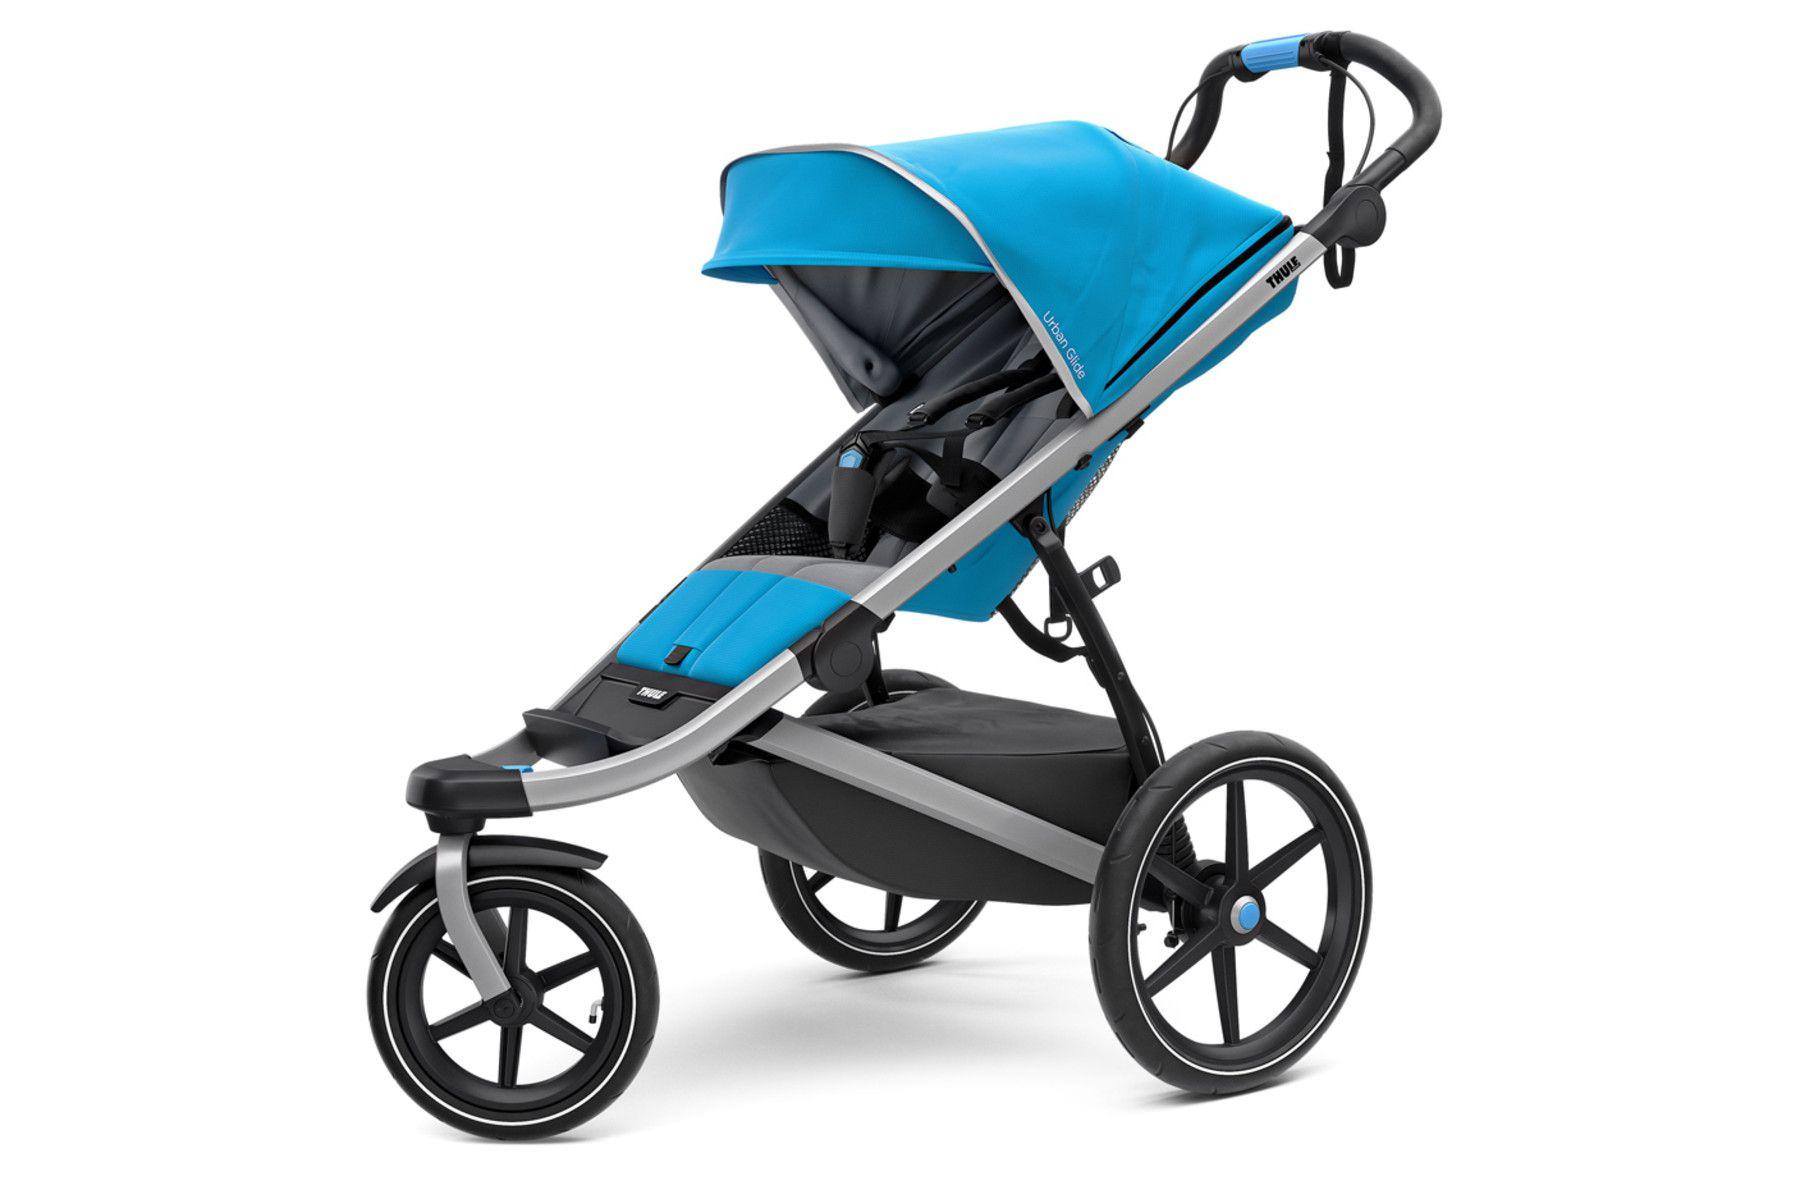 Carrinho Urban Glide 2 - Thule - Azul